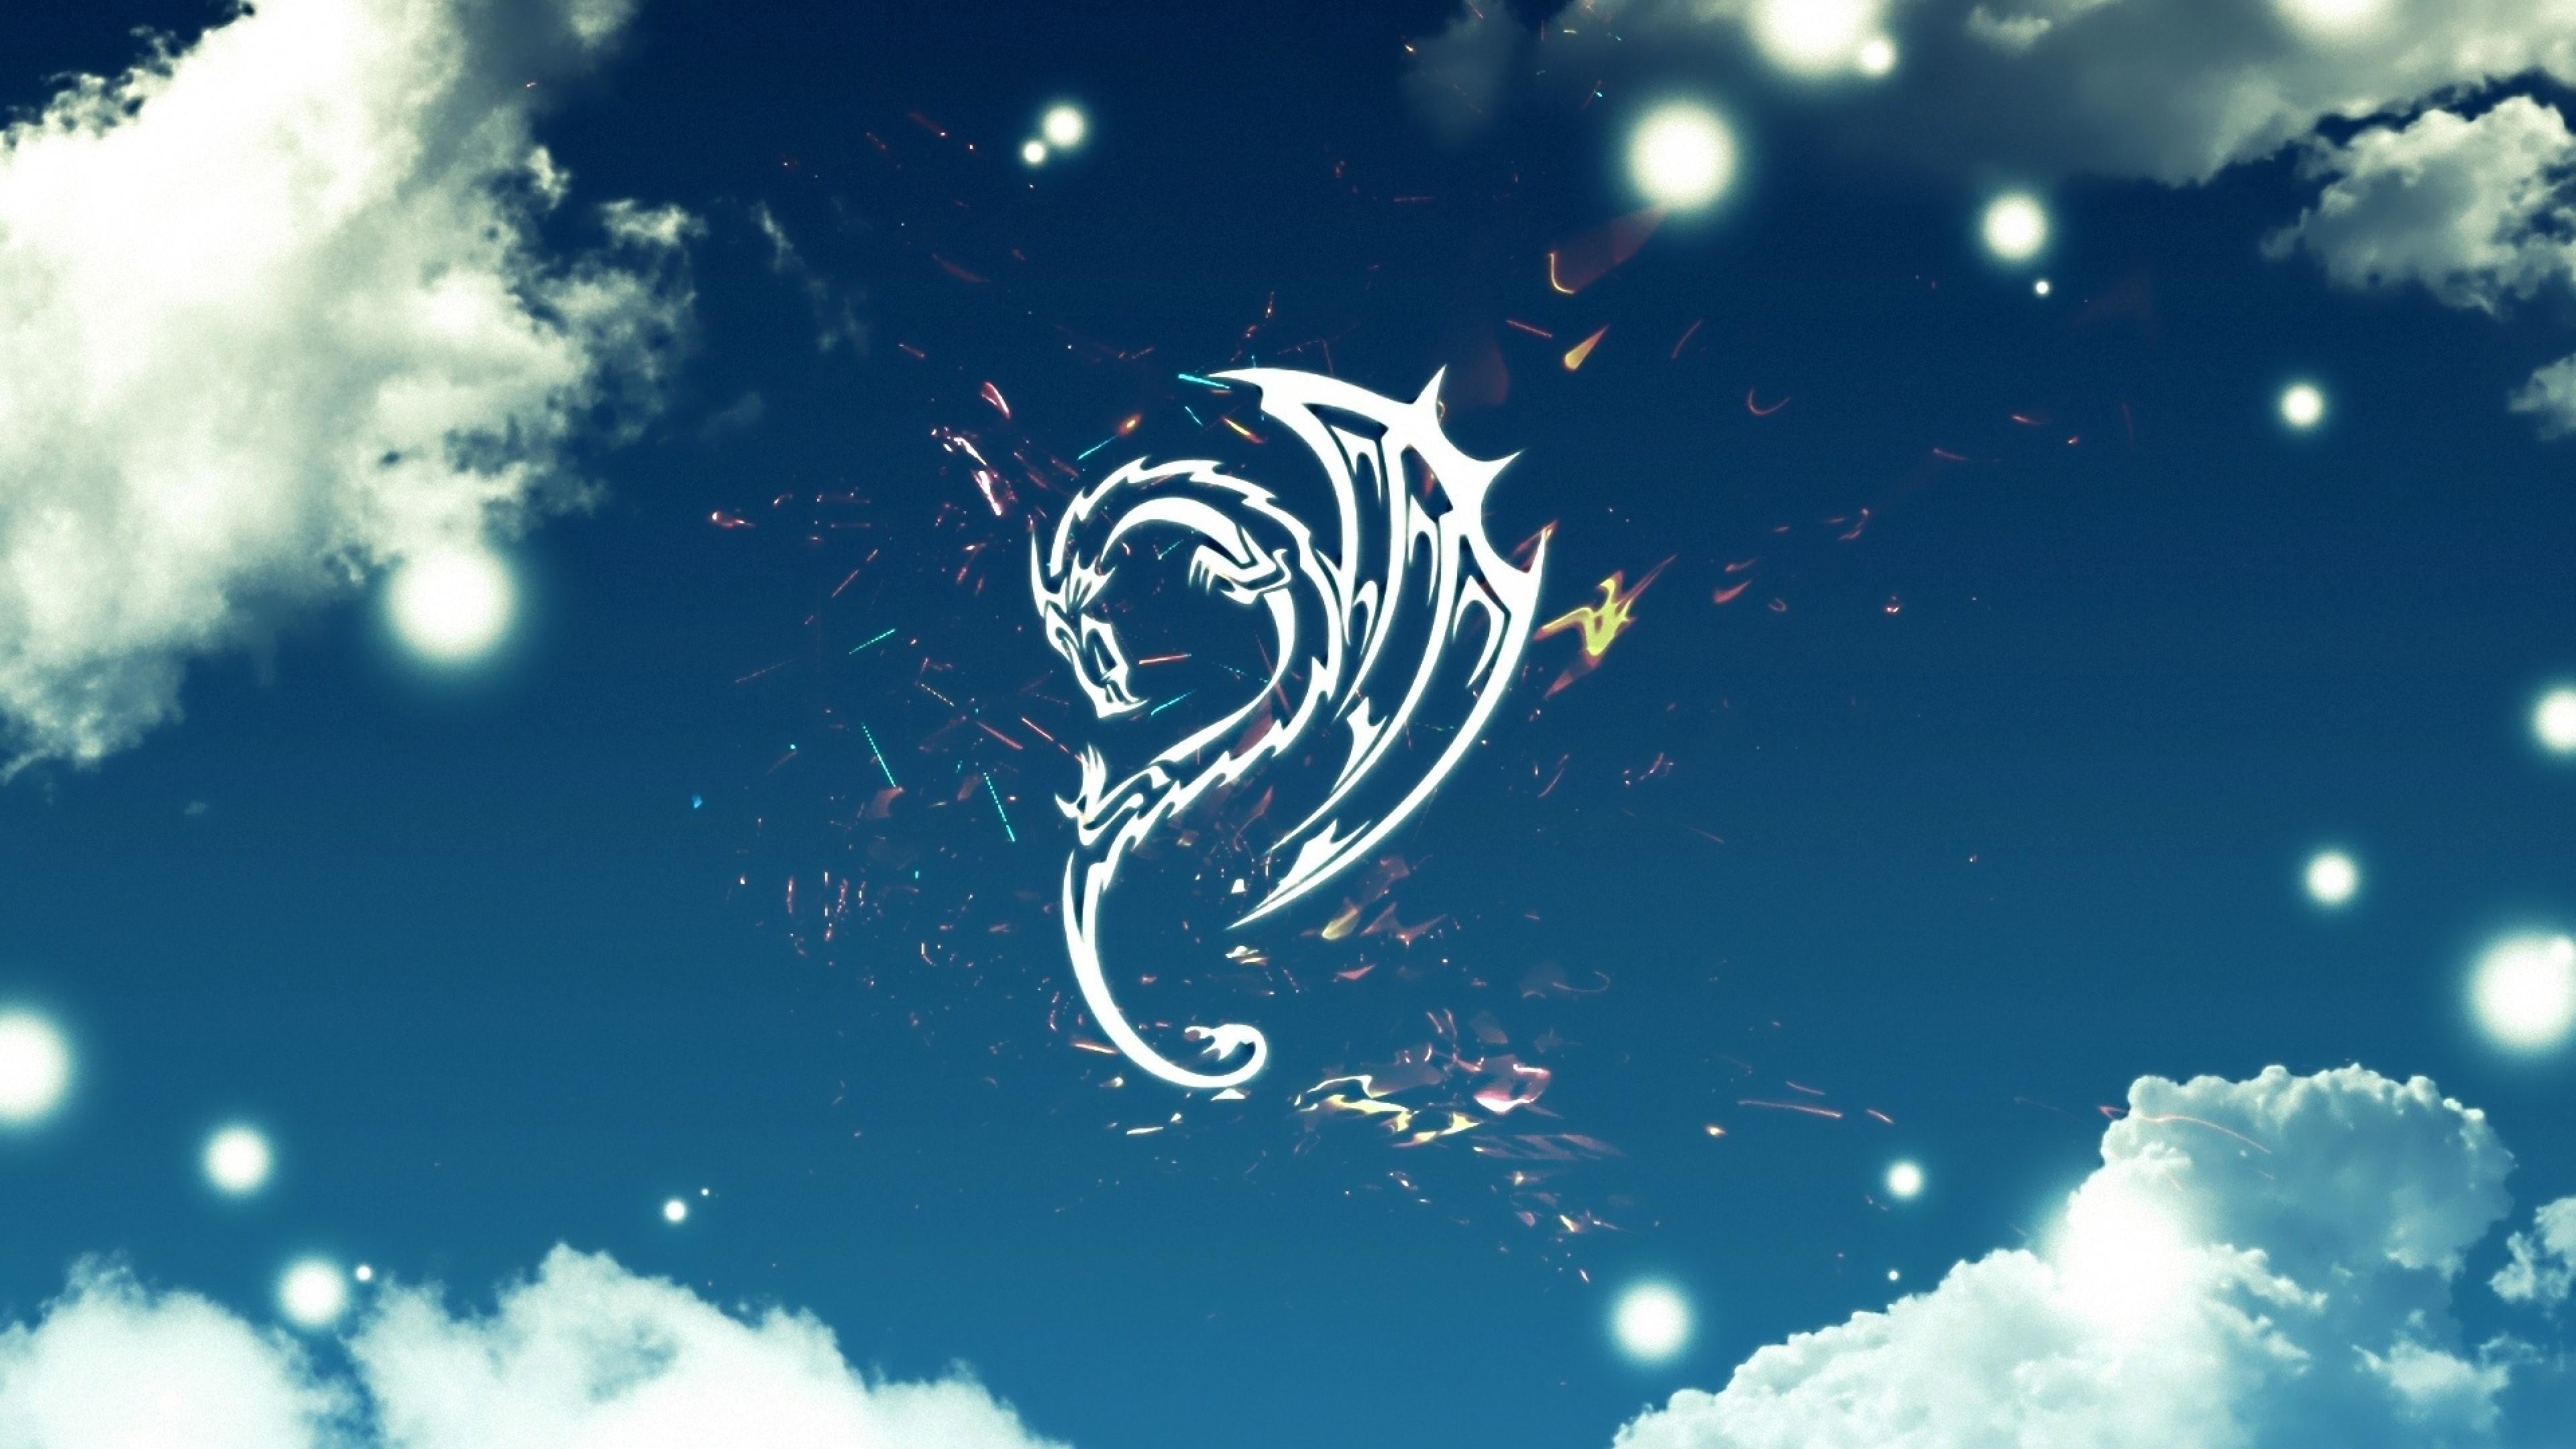 view image. Found on: 4k-dragon-wallpaper/